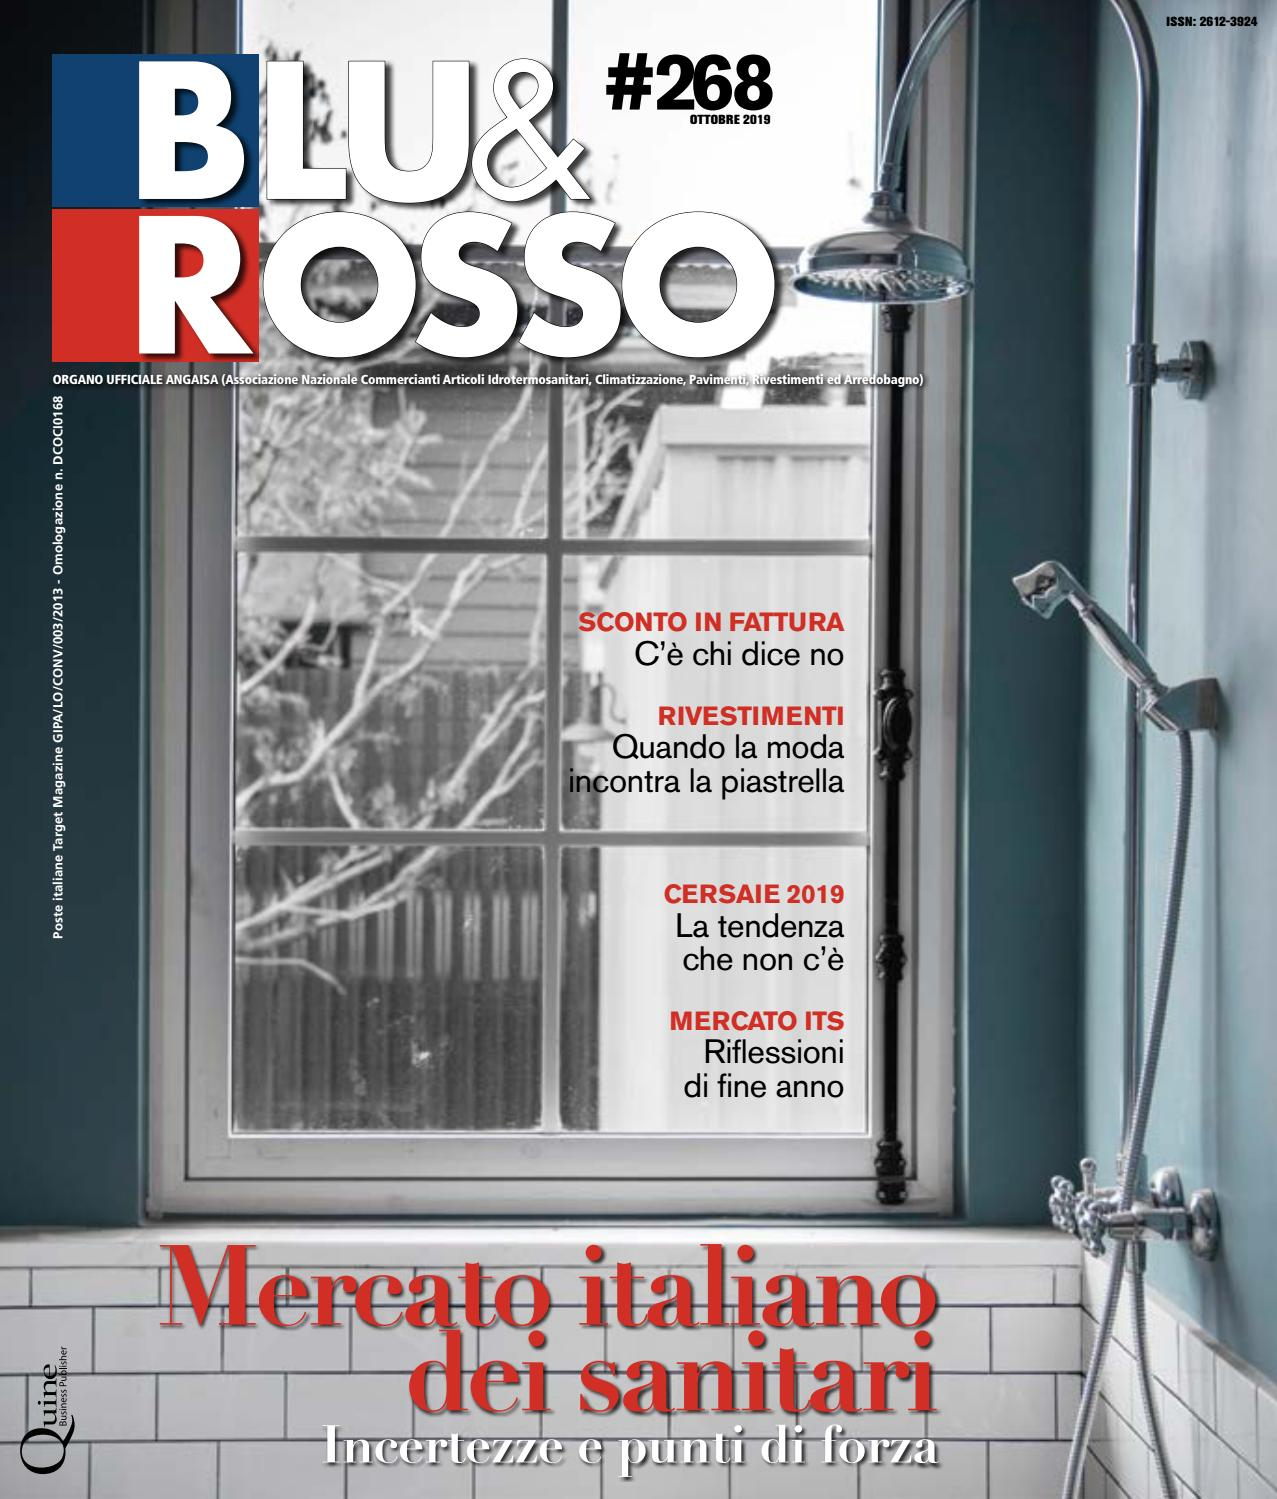 Fontanella Arredamenti Snc Belluno Bl blu&rosso n°268 - ottobre by quine business publisher - issuu